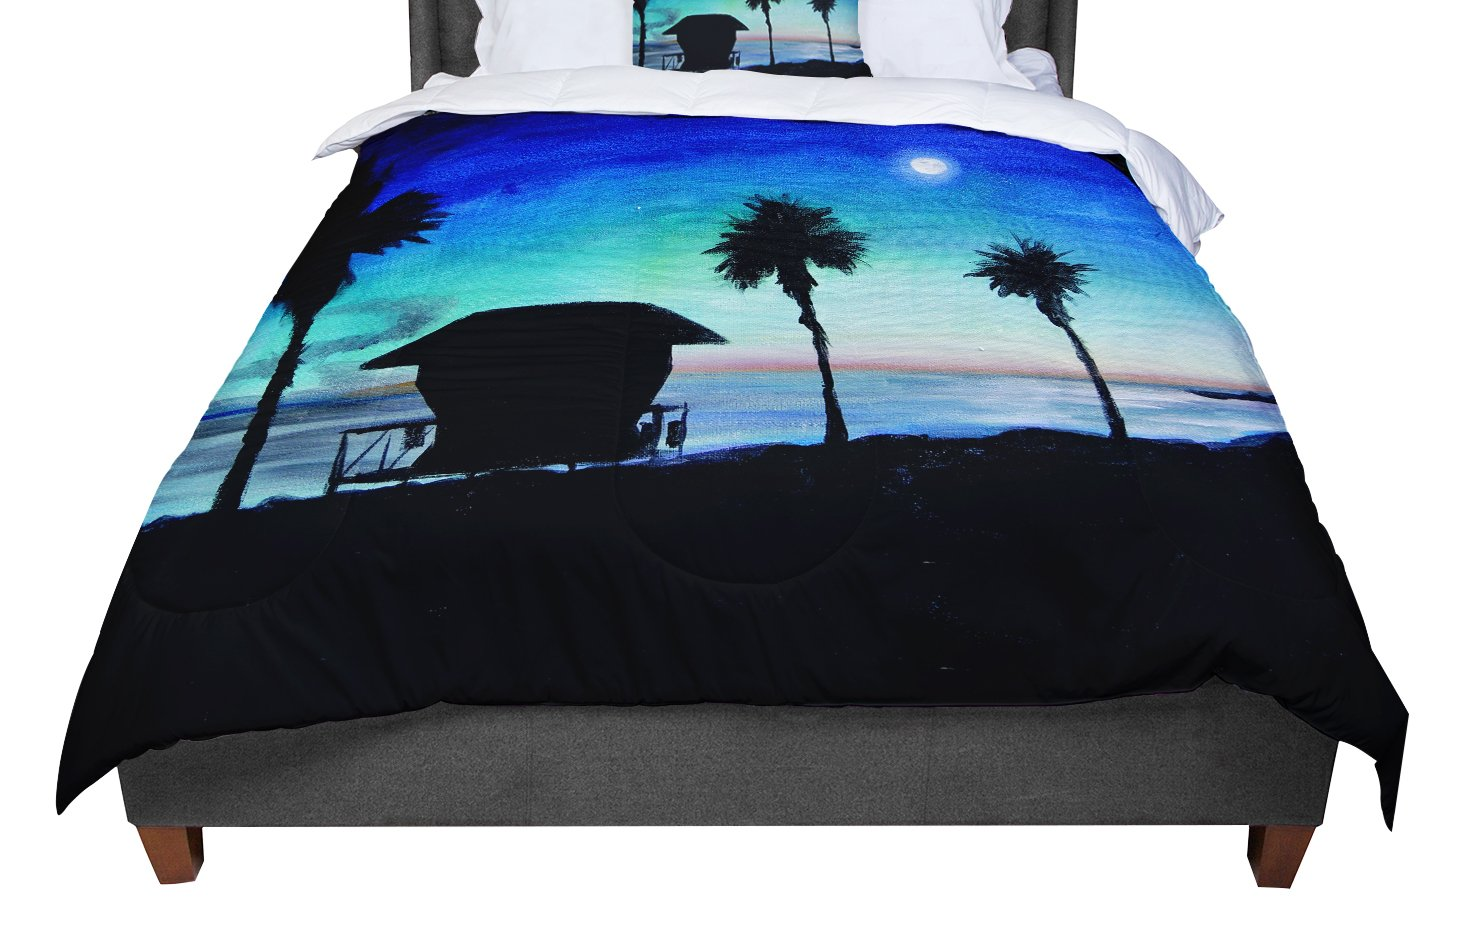 68 X 88 KESS InHouse Strawberringo Three Feathers  Blue Gray Twin Comforter